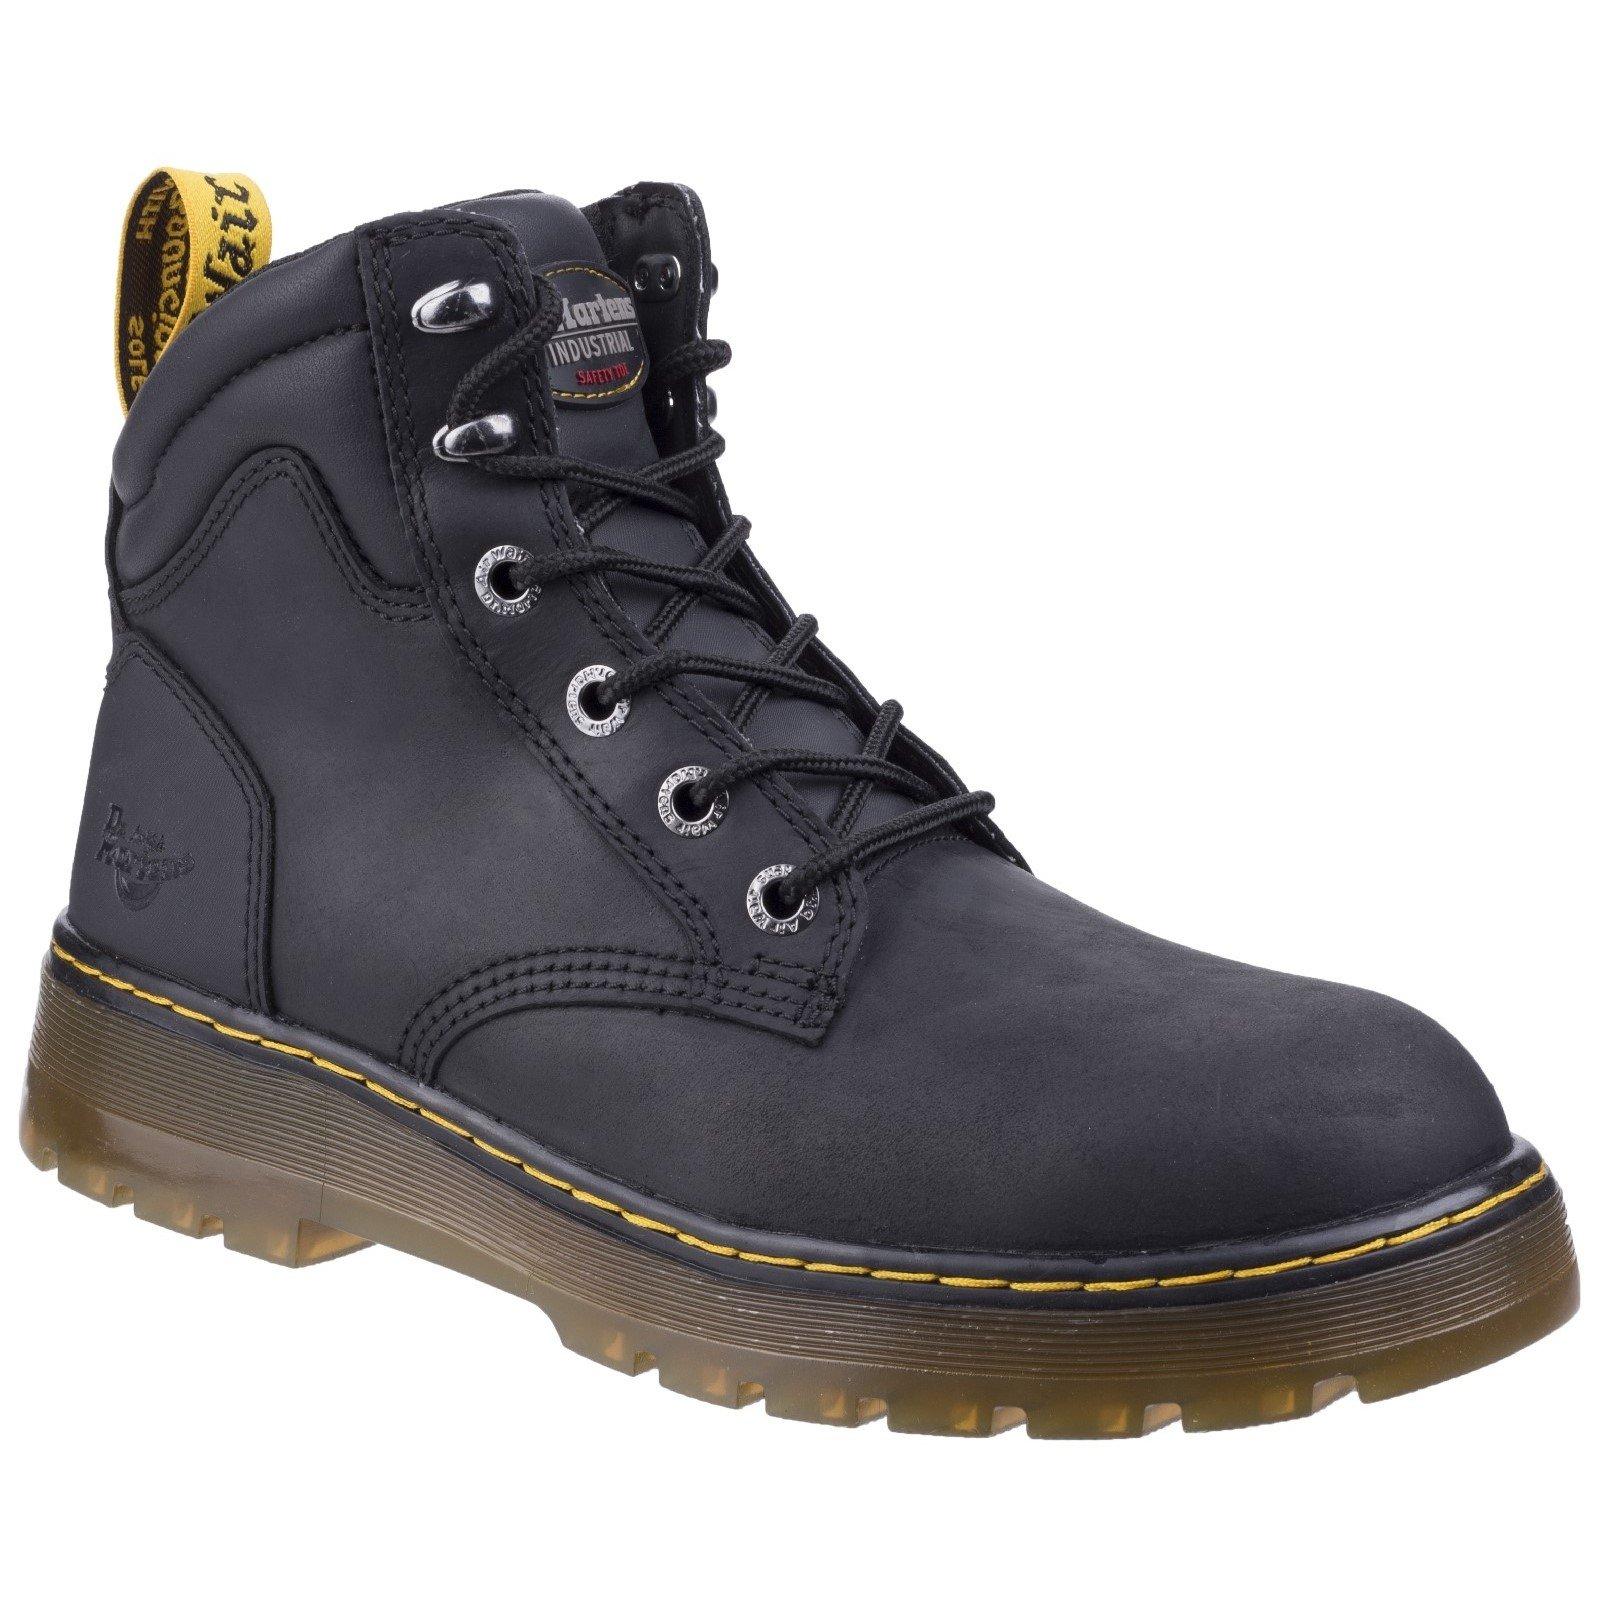 Dr Martens Unisex Brace Hiking Style Safety Boot Various Colours 27702-46606 - Black Republic 4